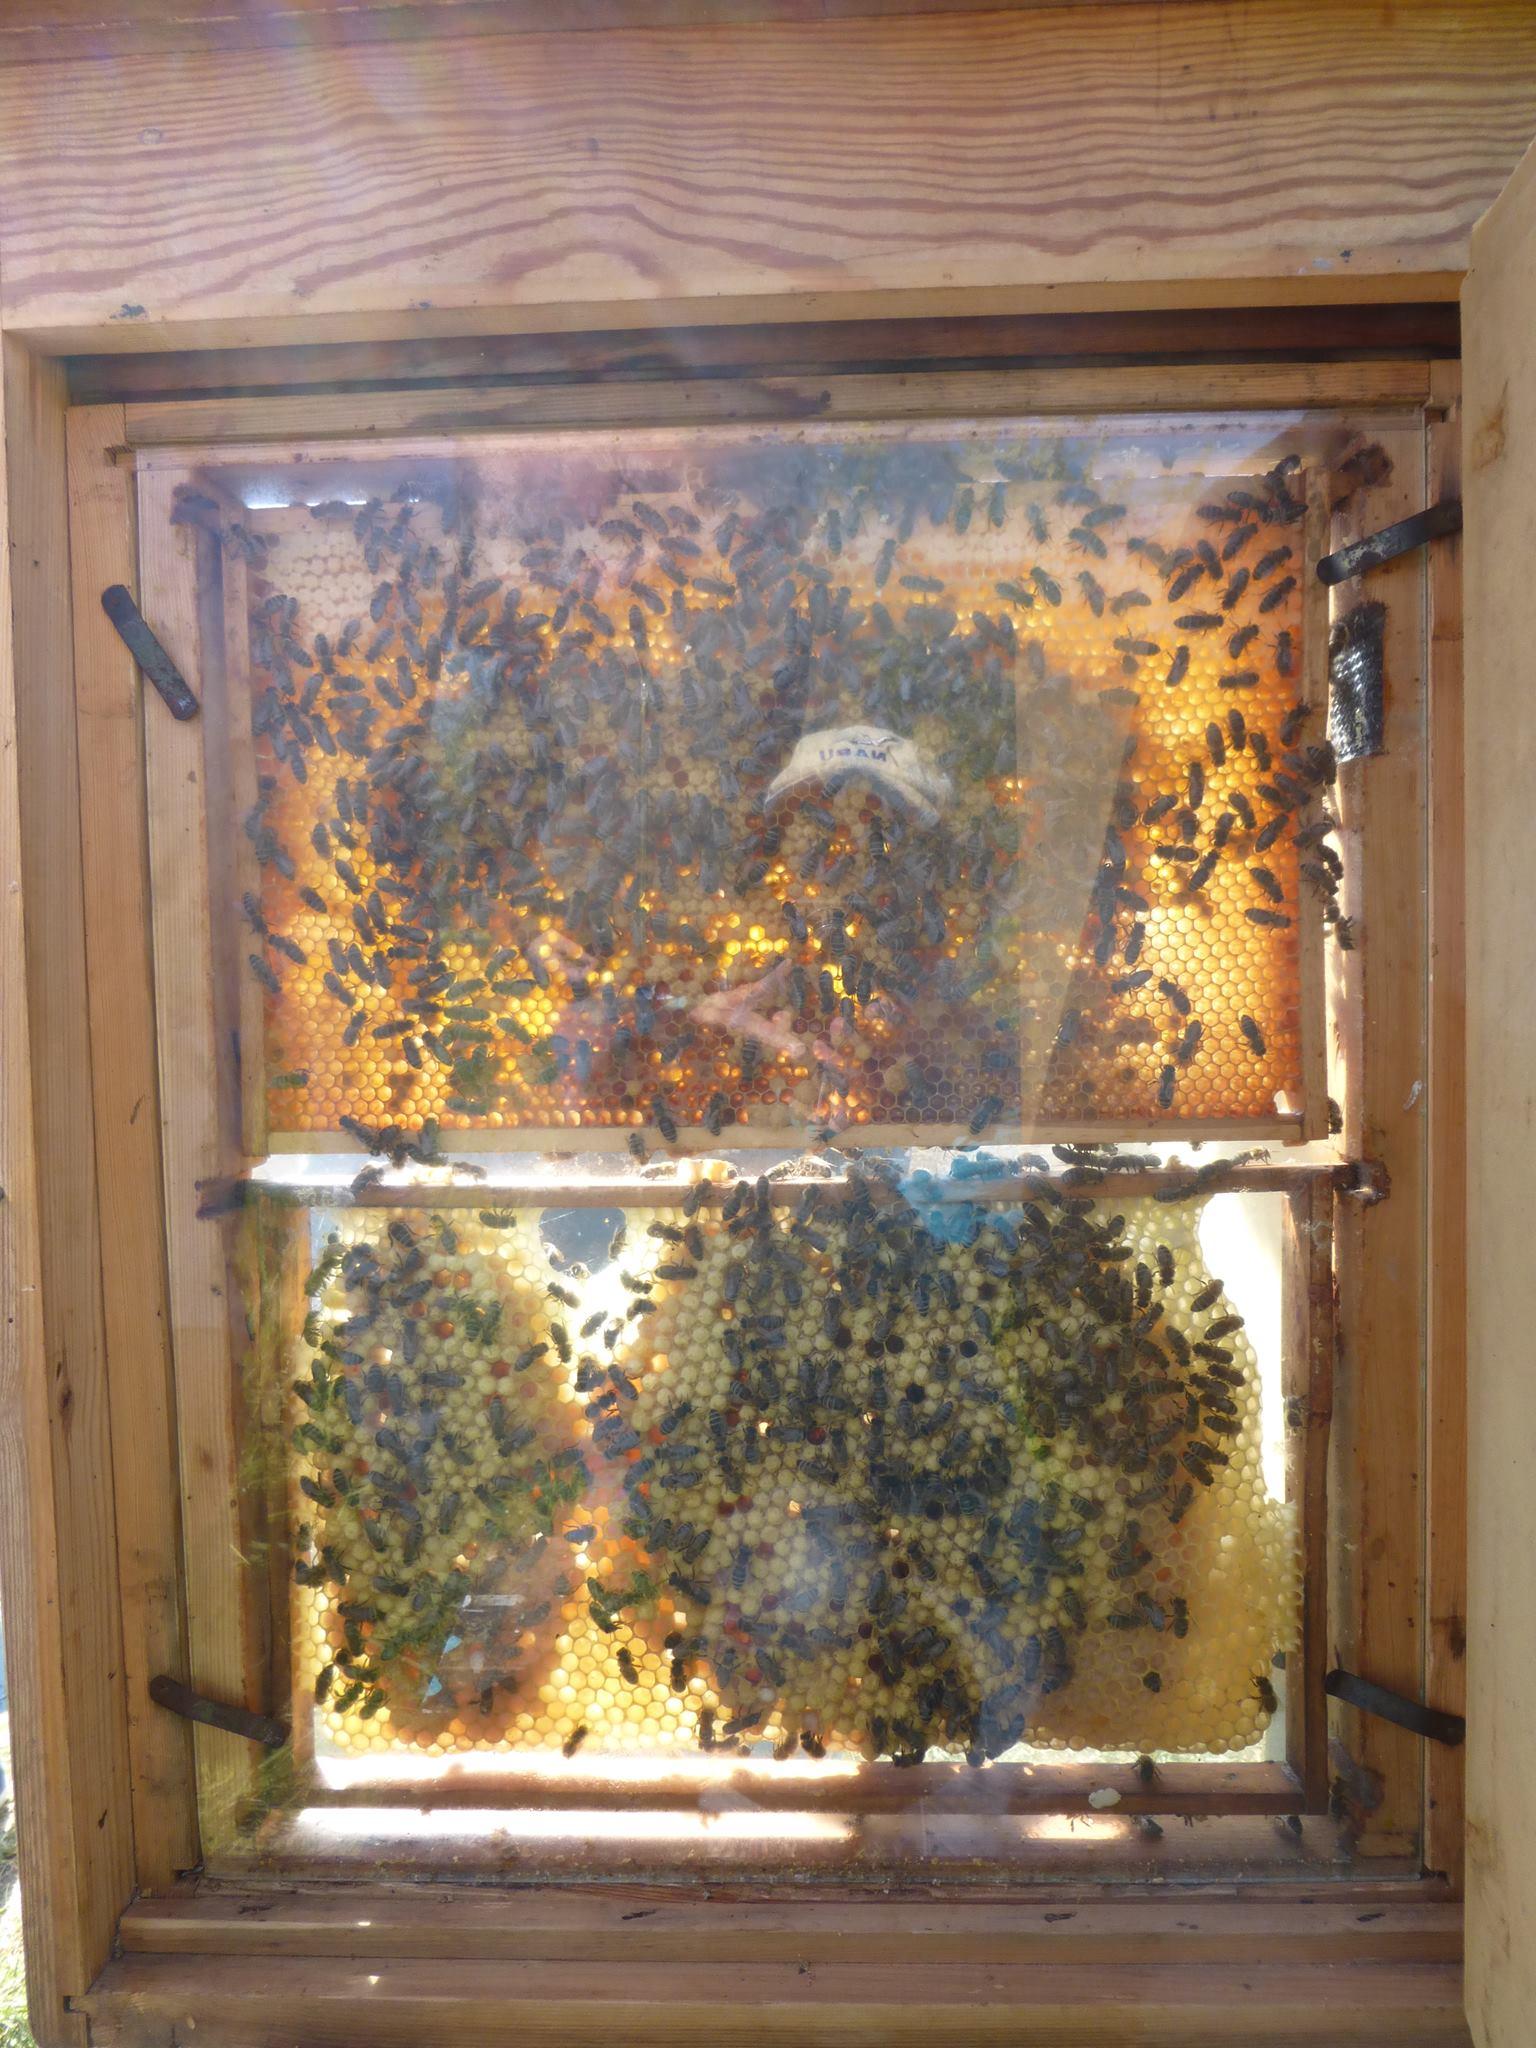 Dem Bienenvolk ganz nah